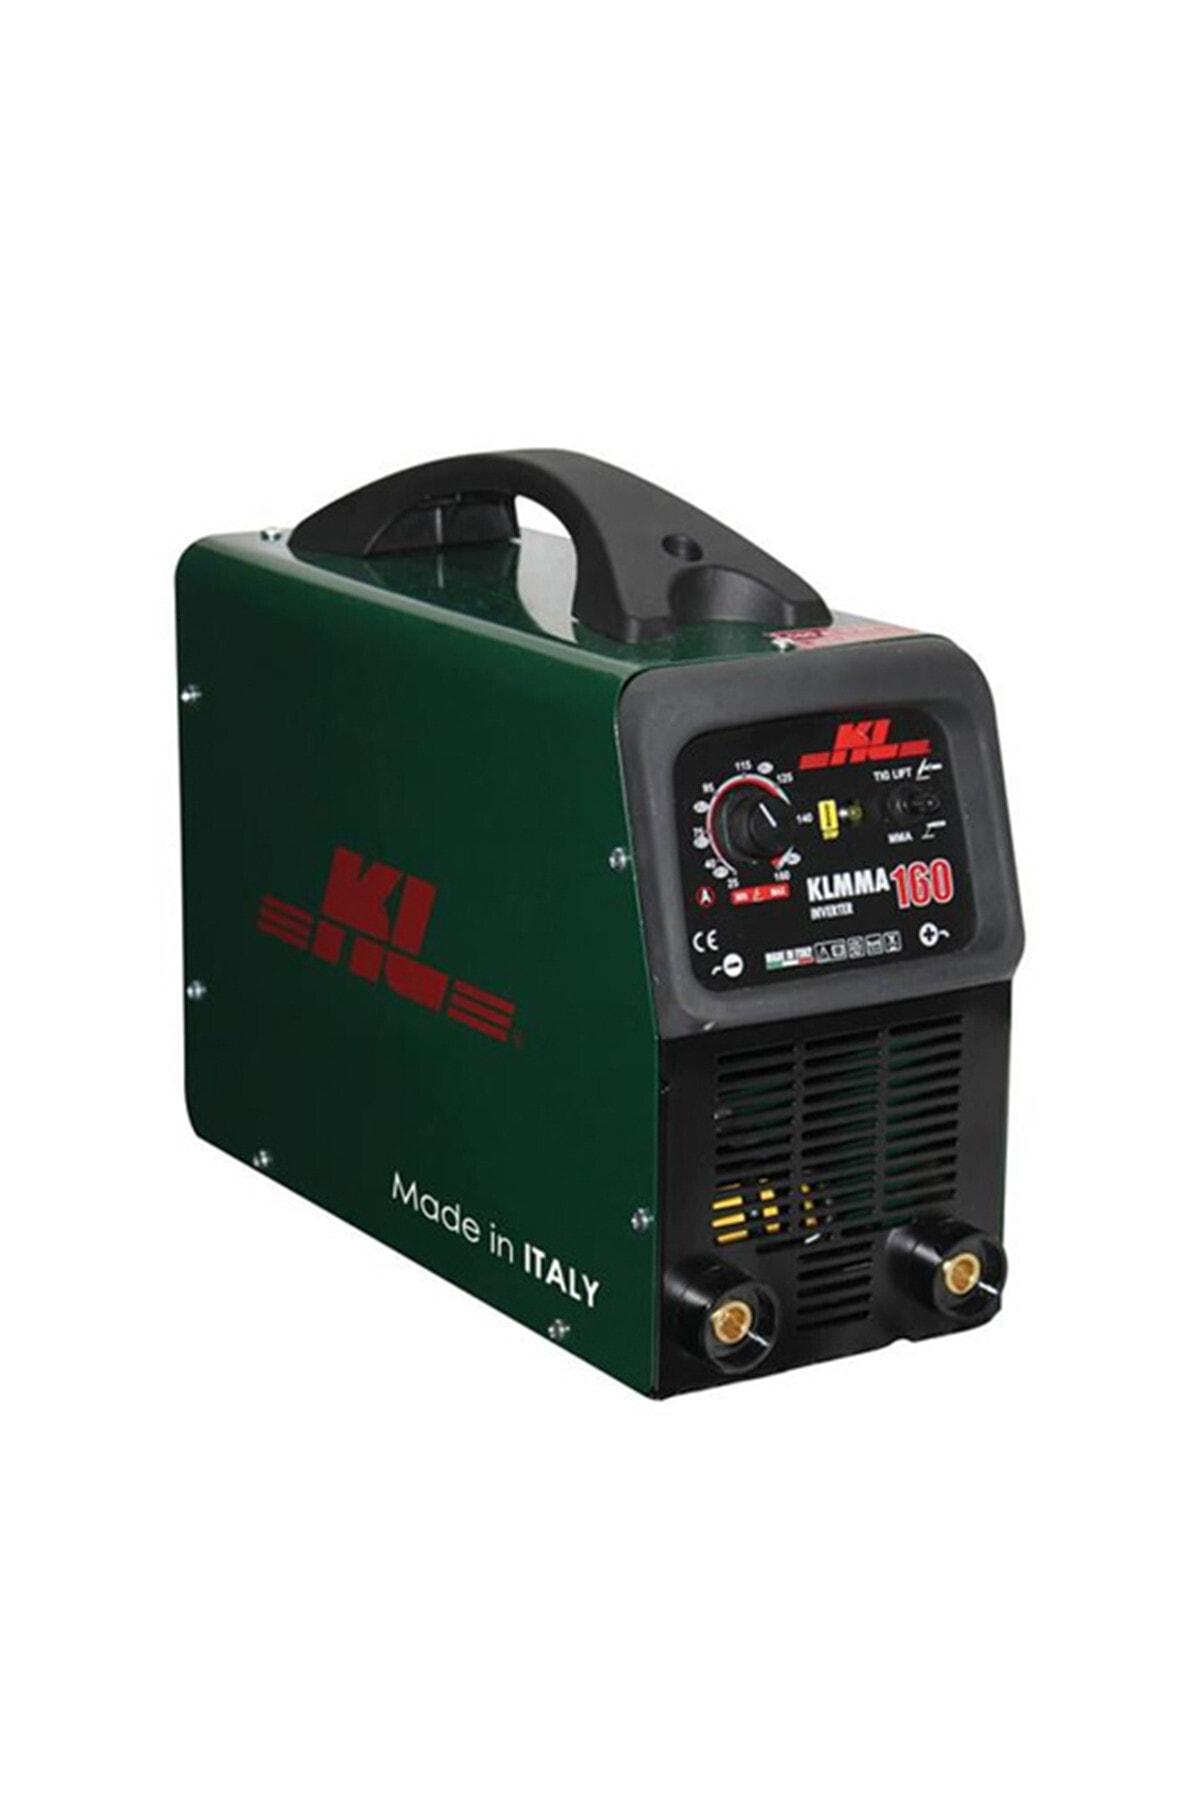 KALE Klpro Klmma160 160 Amper Inverter Kaynak Makinesi 1